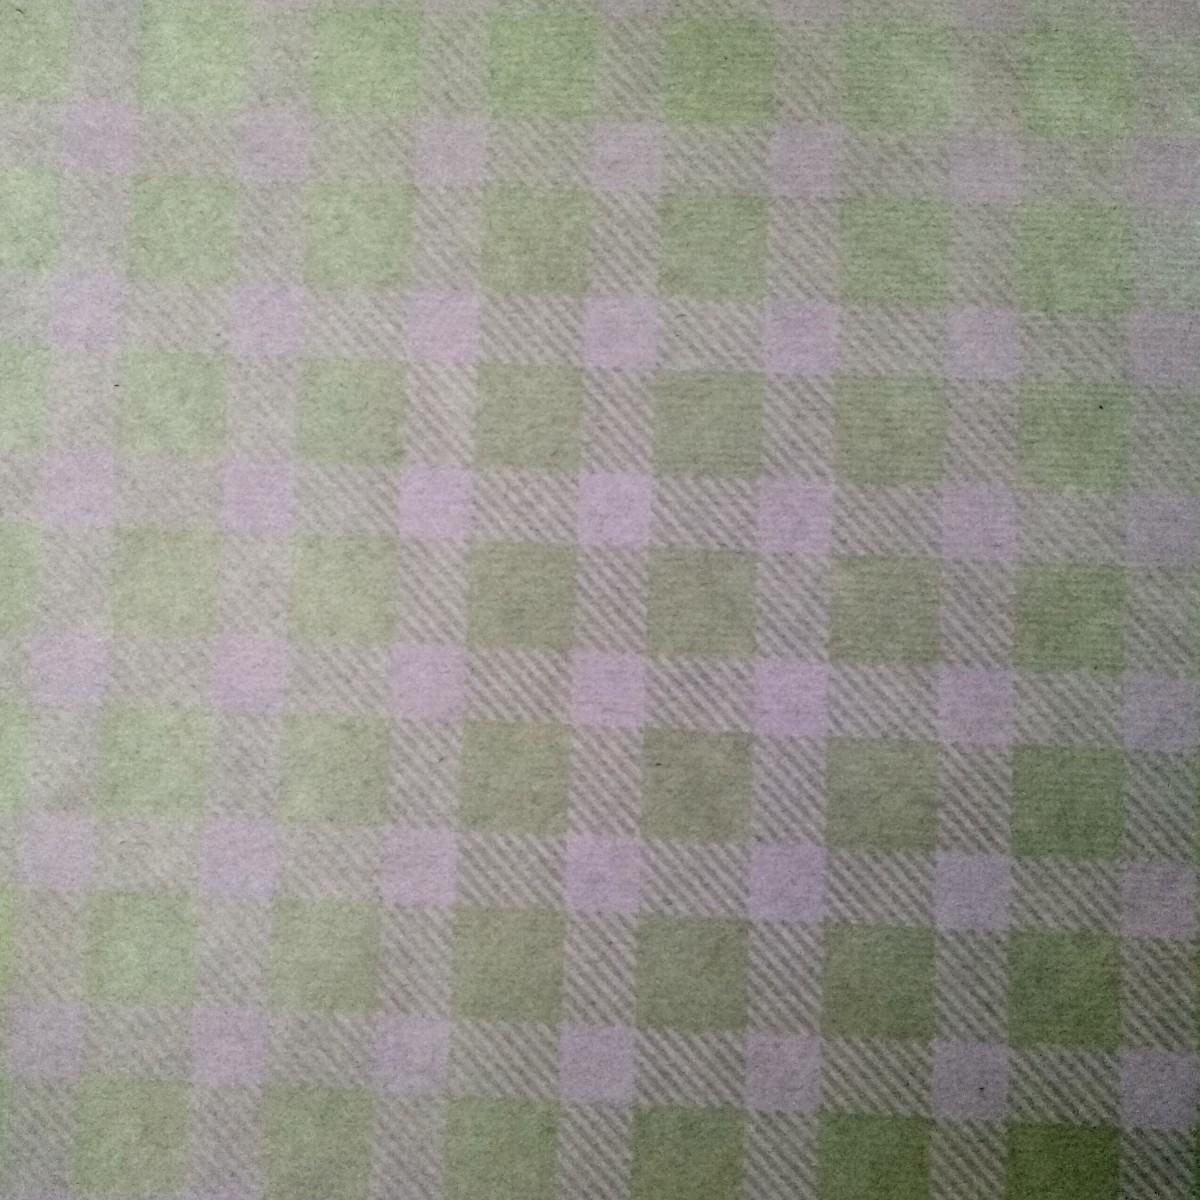 7213 Chex Print Pale Pink 50cmx25m Kraft Paper - 1 Roll